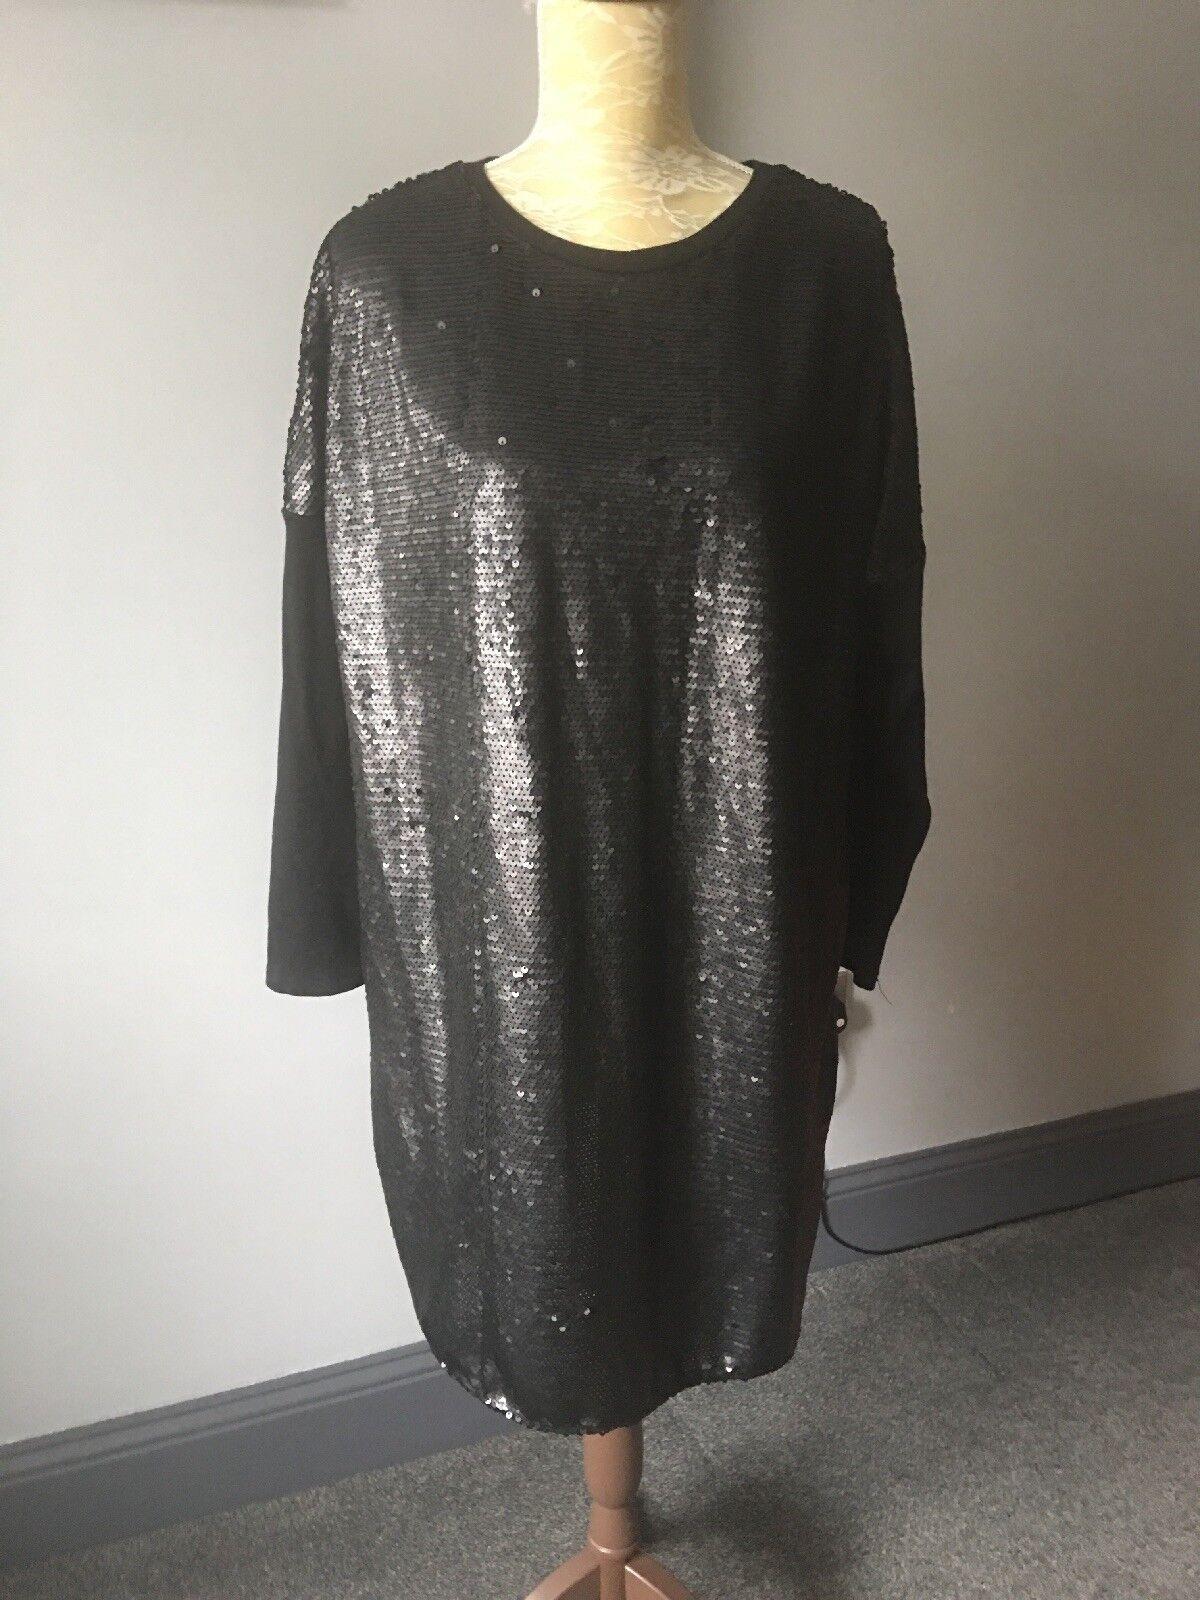 ️LADIESRIVER ISLANDSEQUIN DRESS16-18WORN ONCE